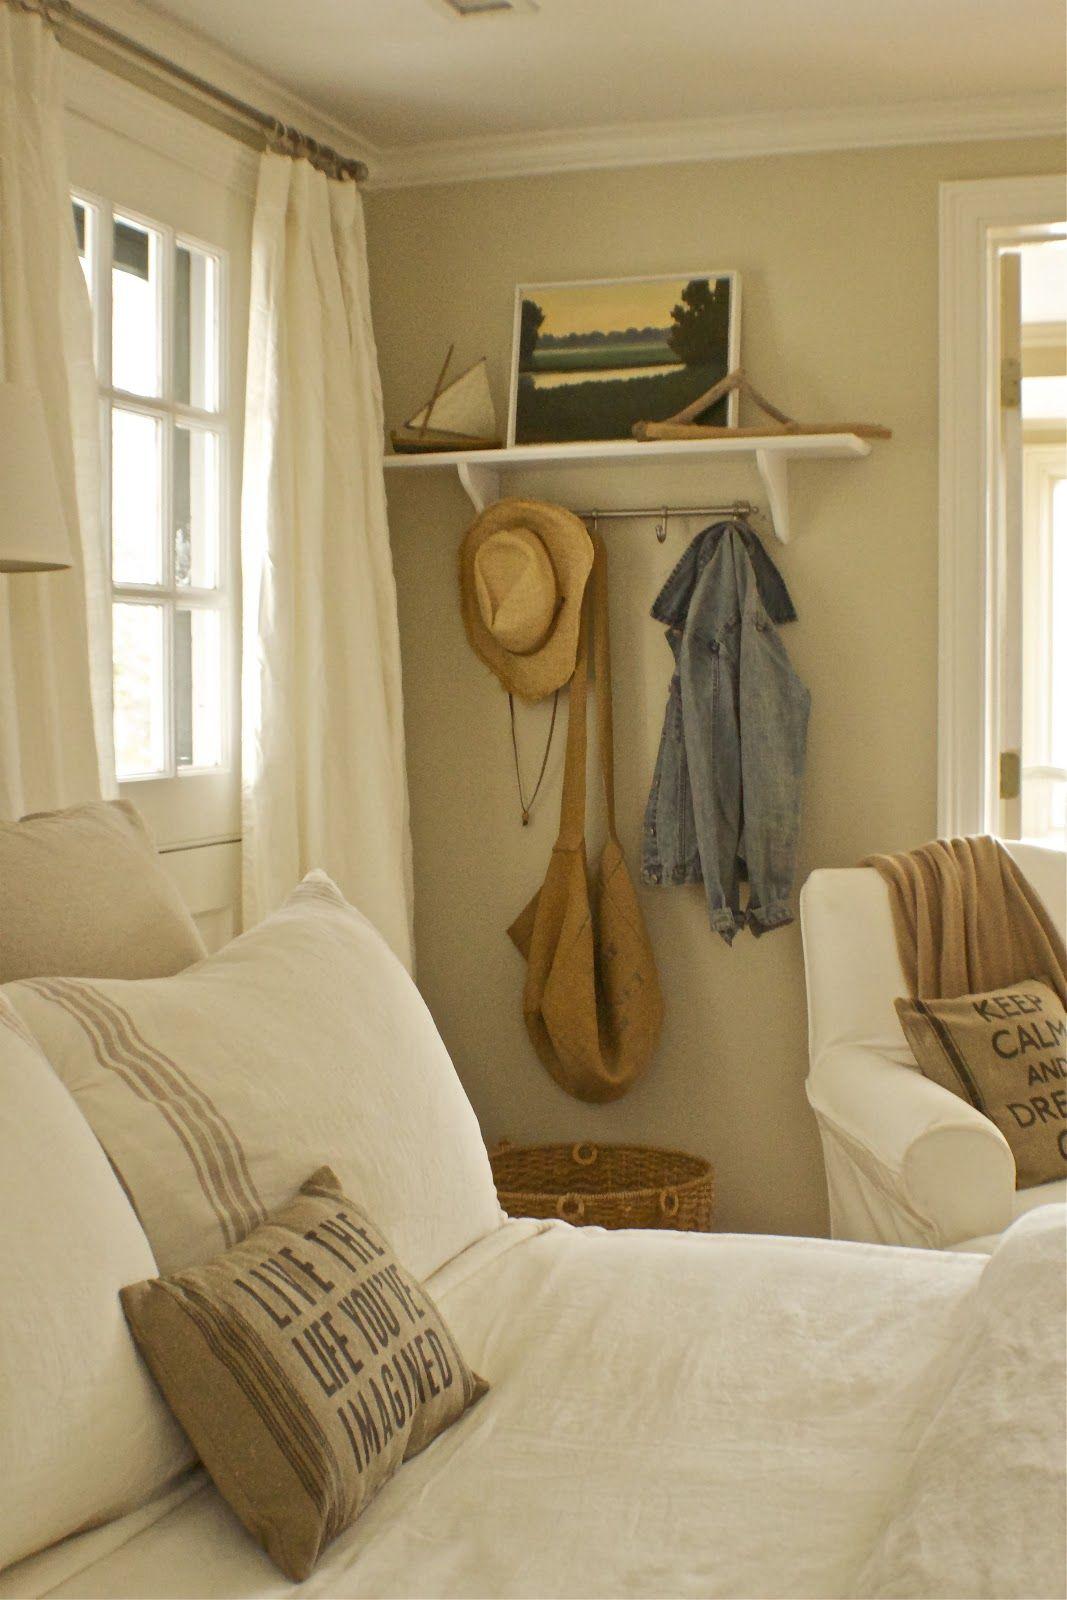 Master Bedroom Paint Colors Benjamin Moore Wall Paint Color Is Benjamin Moore Light Pewter 1464 Trim Paint